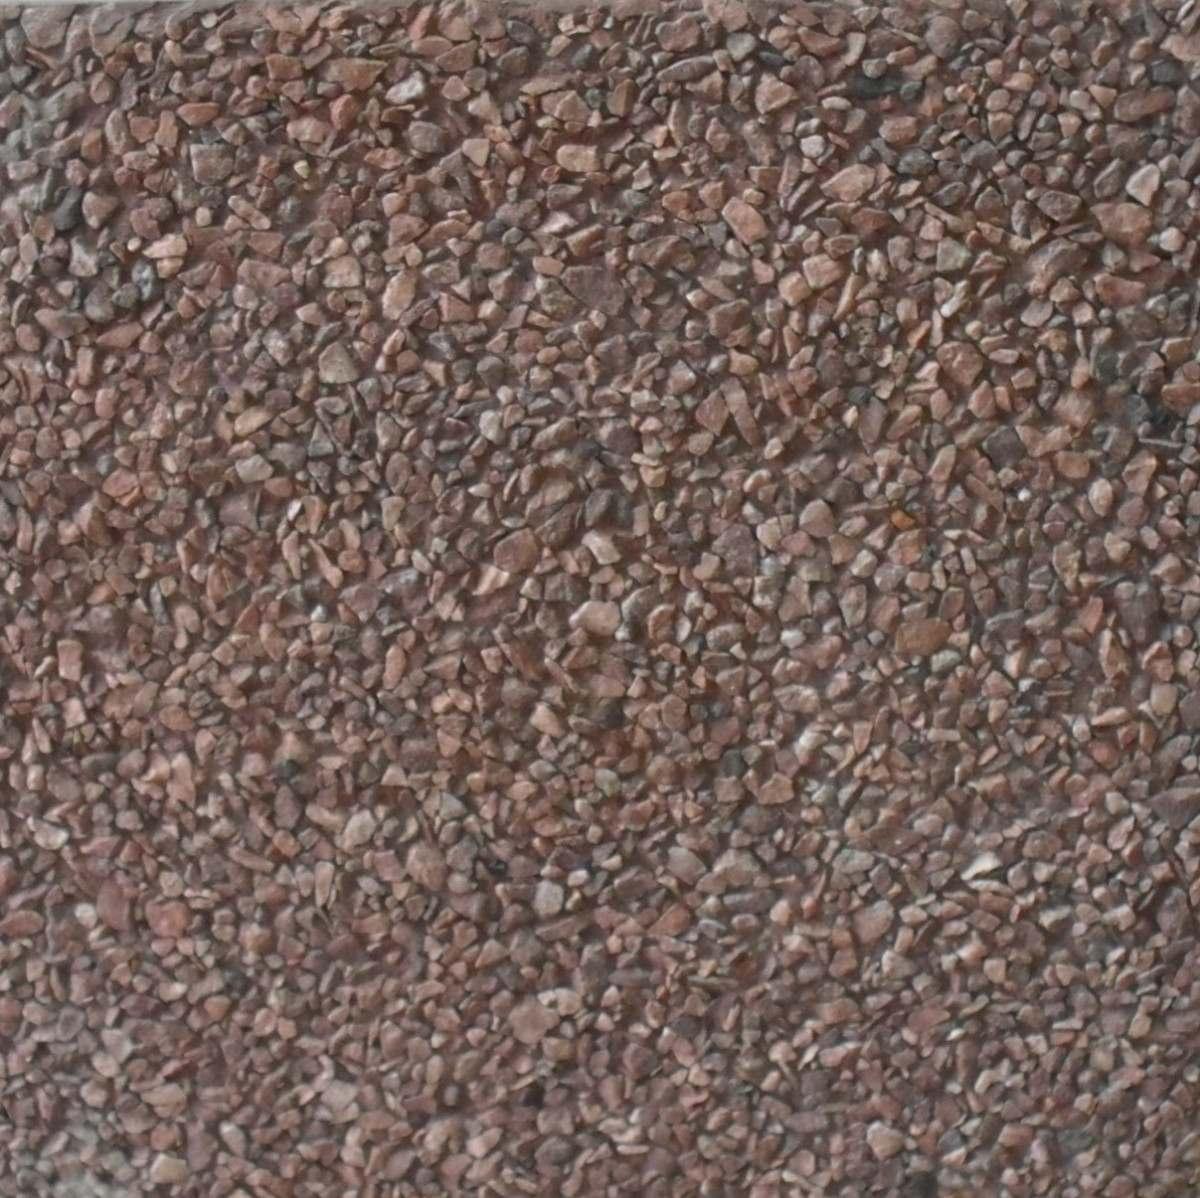 Baldosas de piedra piedra de lava volcnica piedra azulejo for Baldosas de piedra para exterior